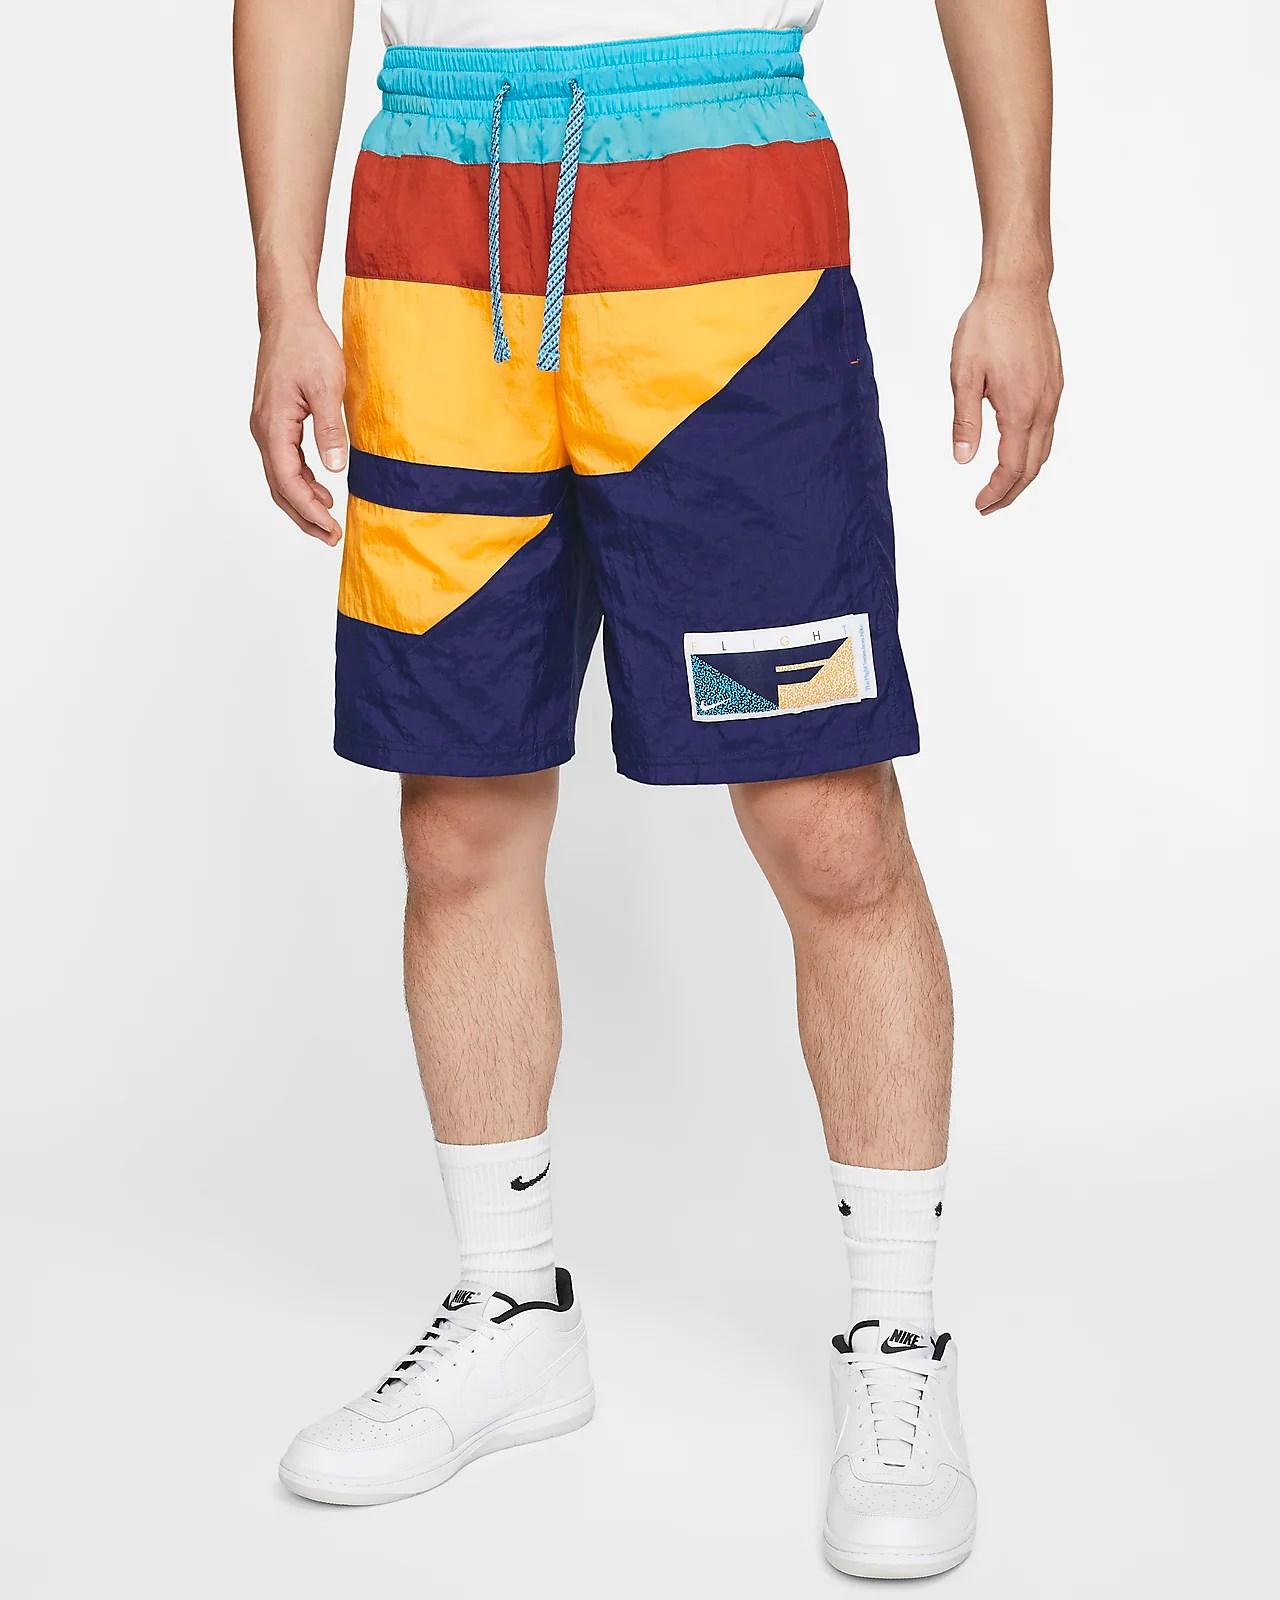 Nike Flight 男款籃球褲. Nike TW